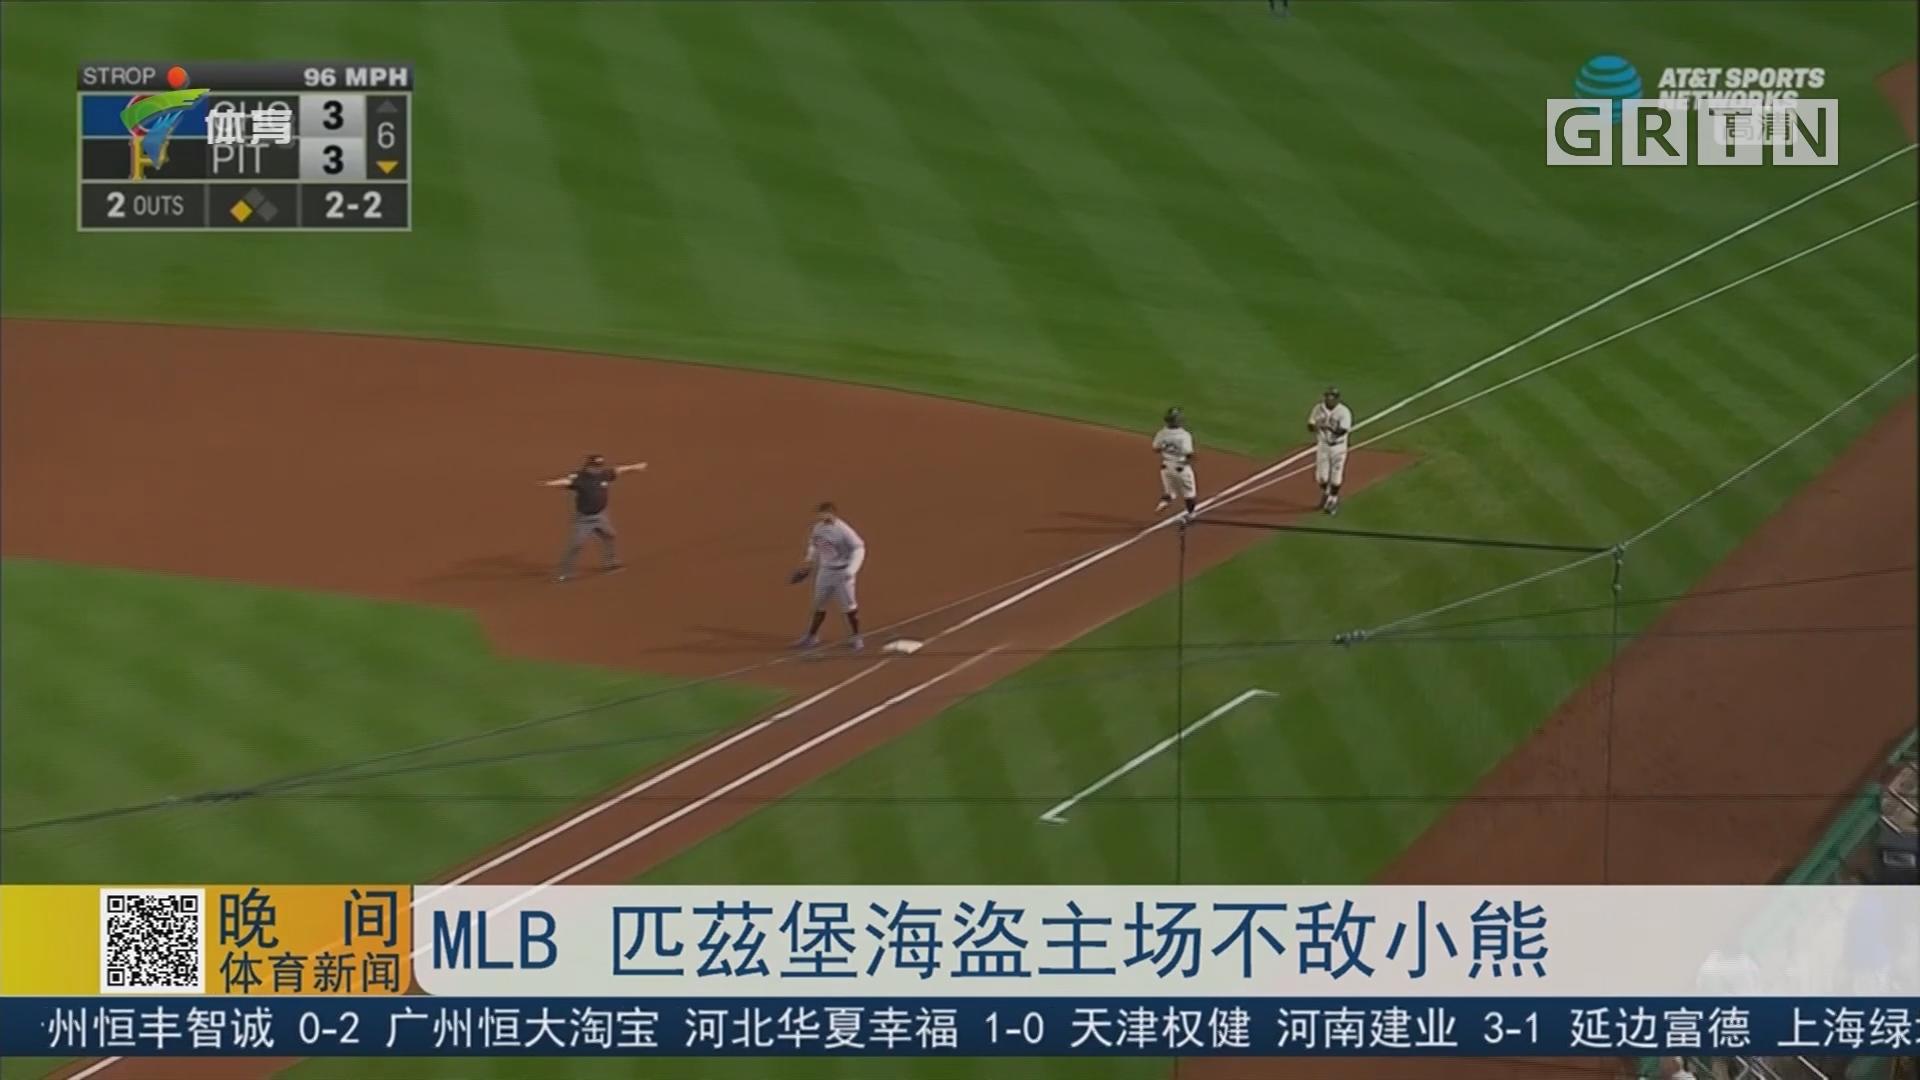 MLB 匹兹堡海盗主场不敌小熊